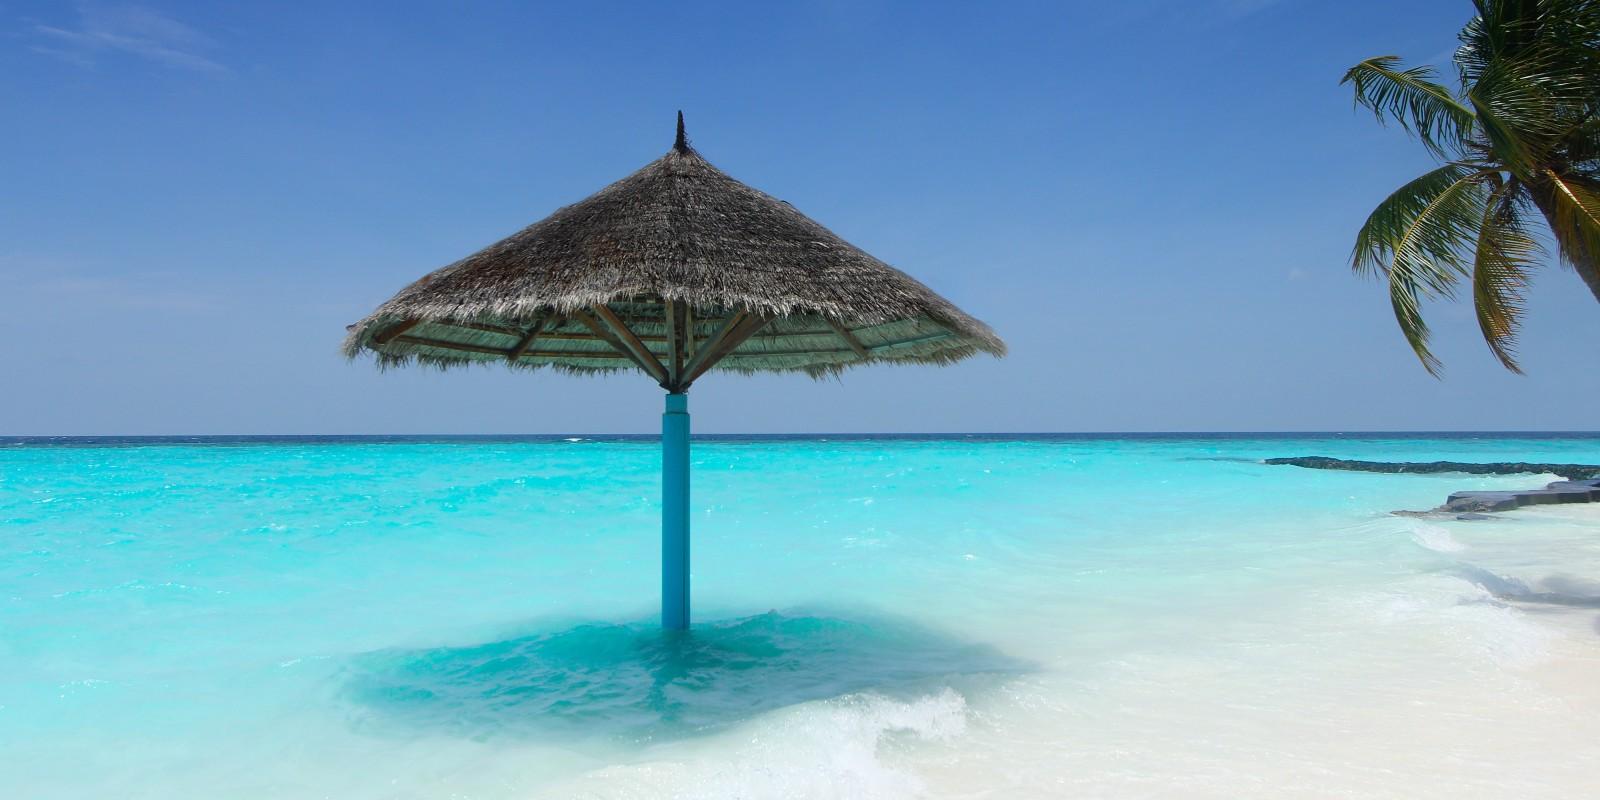 Luxurious island retreats in The Maldives